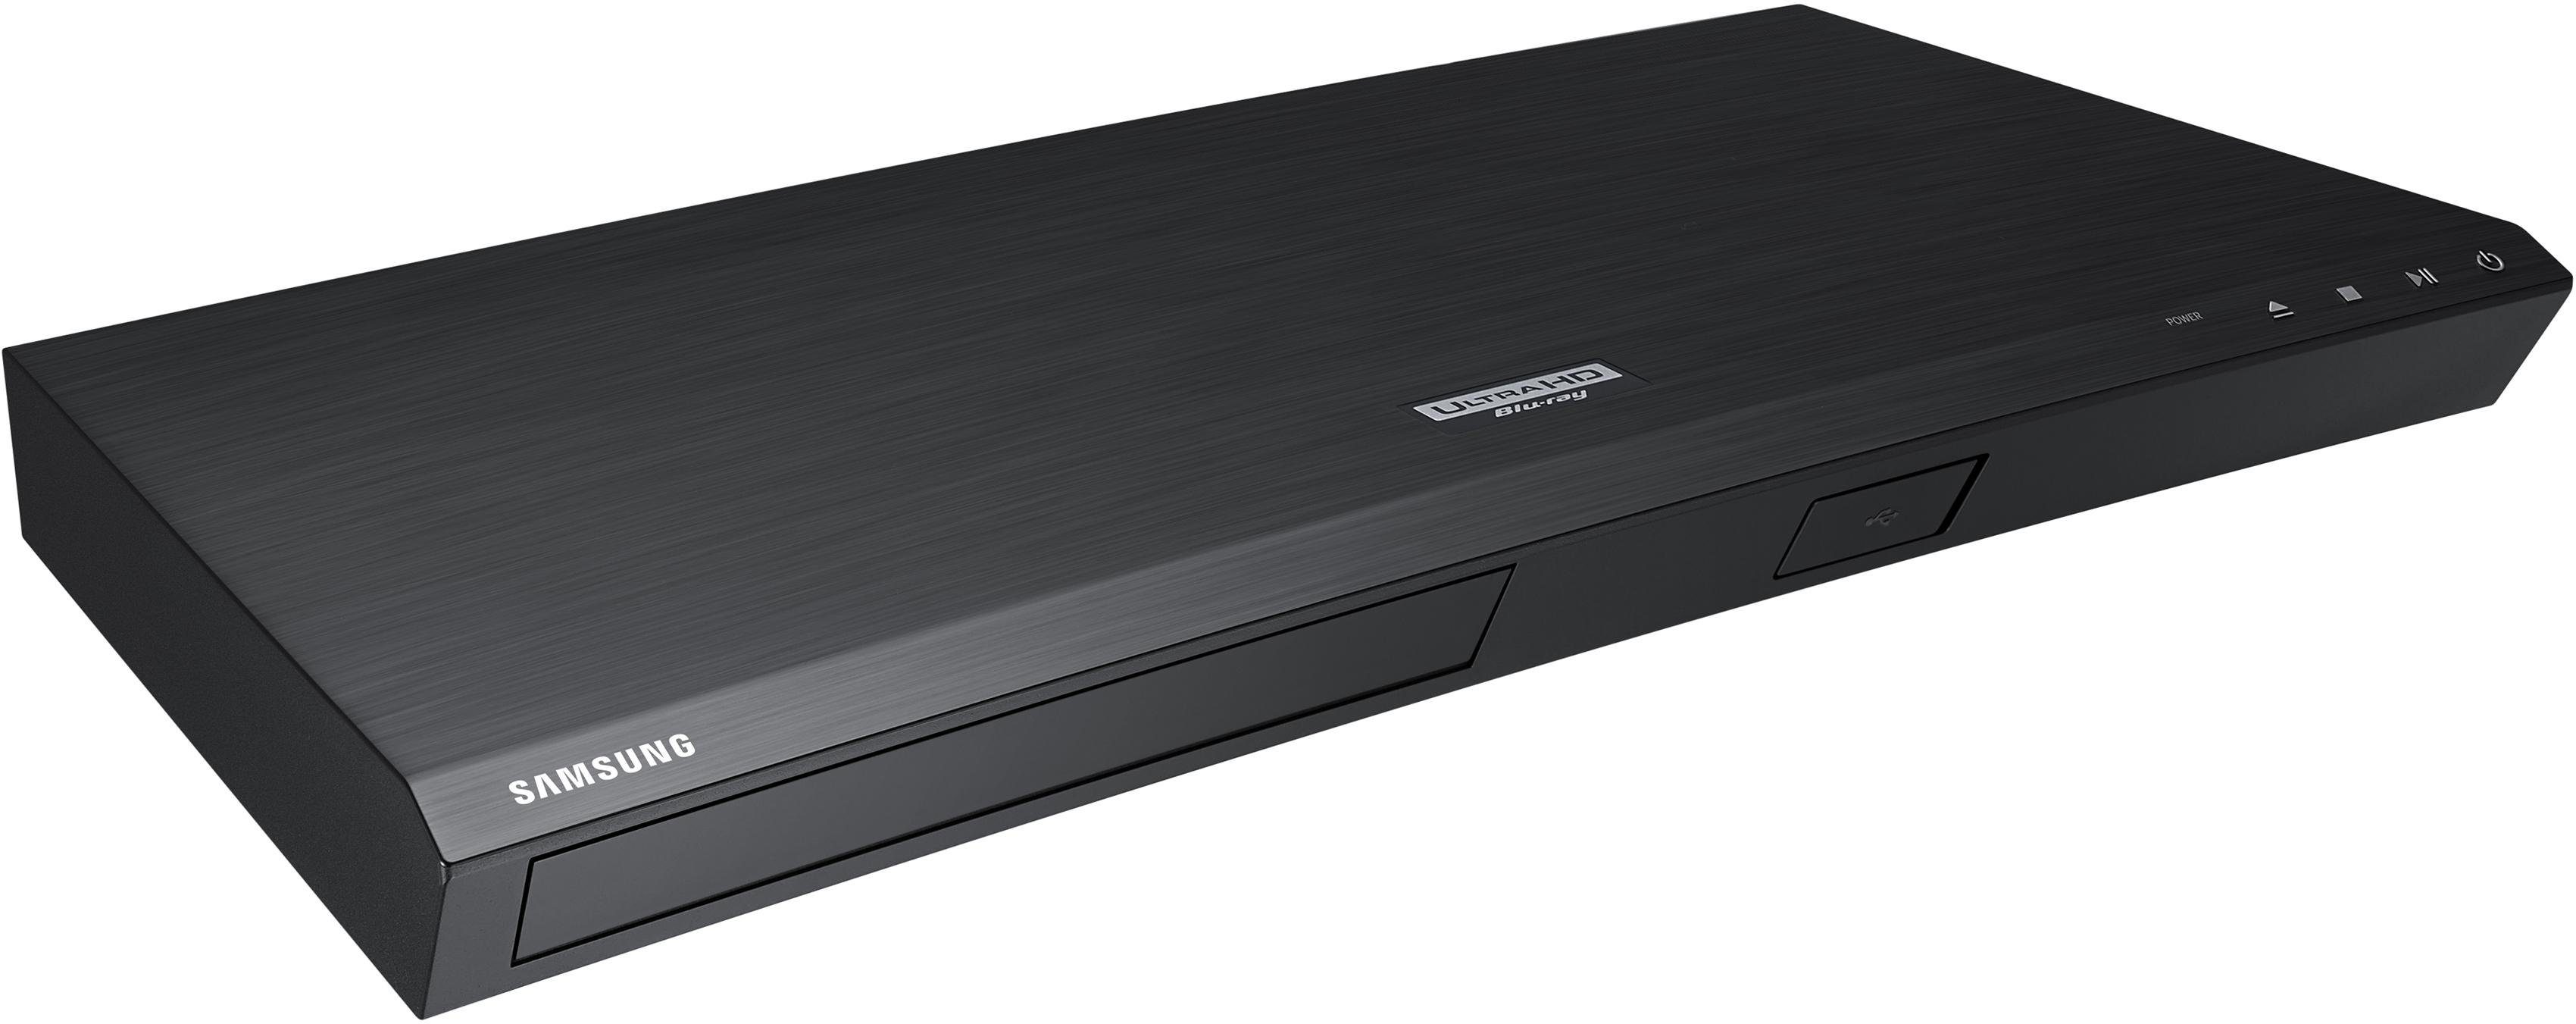 Samsung UBD-8500/EN Ultra-HD Blu-Ray-Player